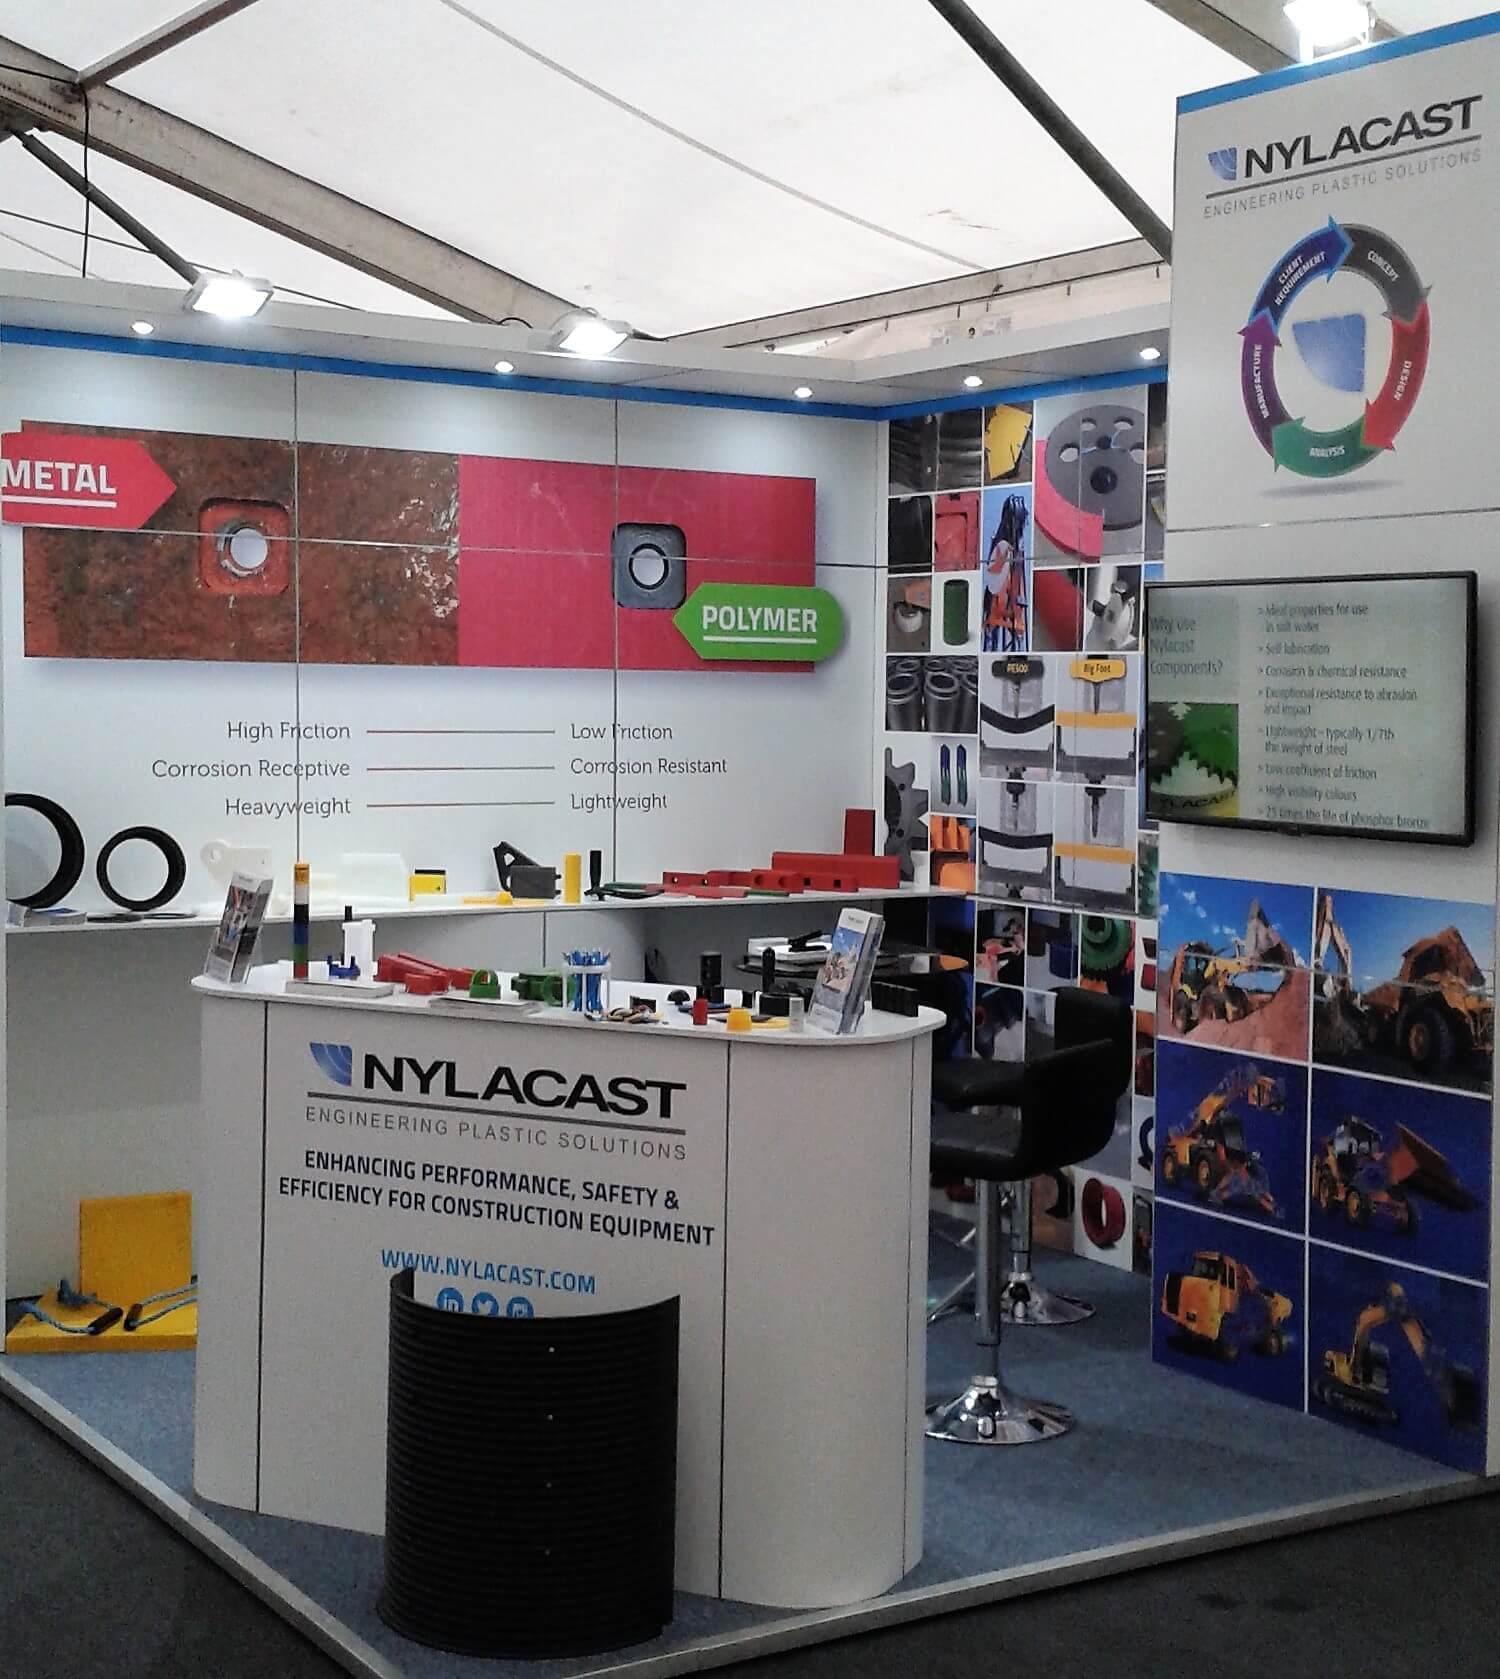 Nylacast at Platworx 2017